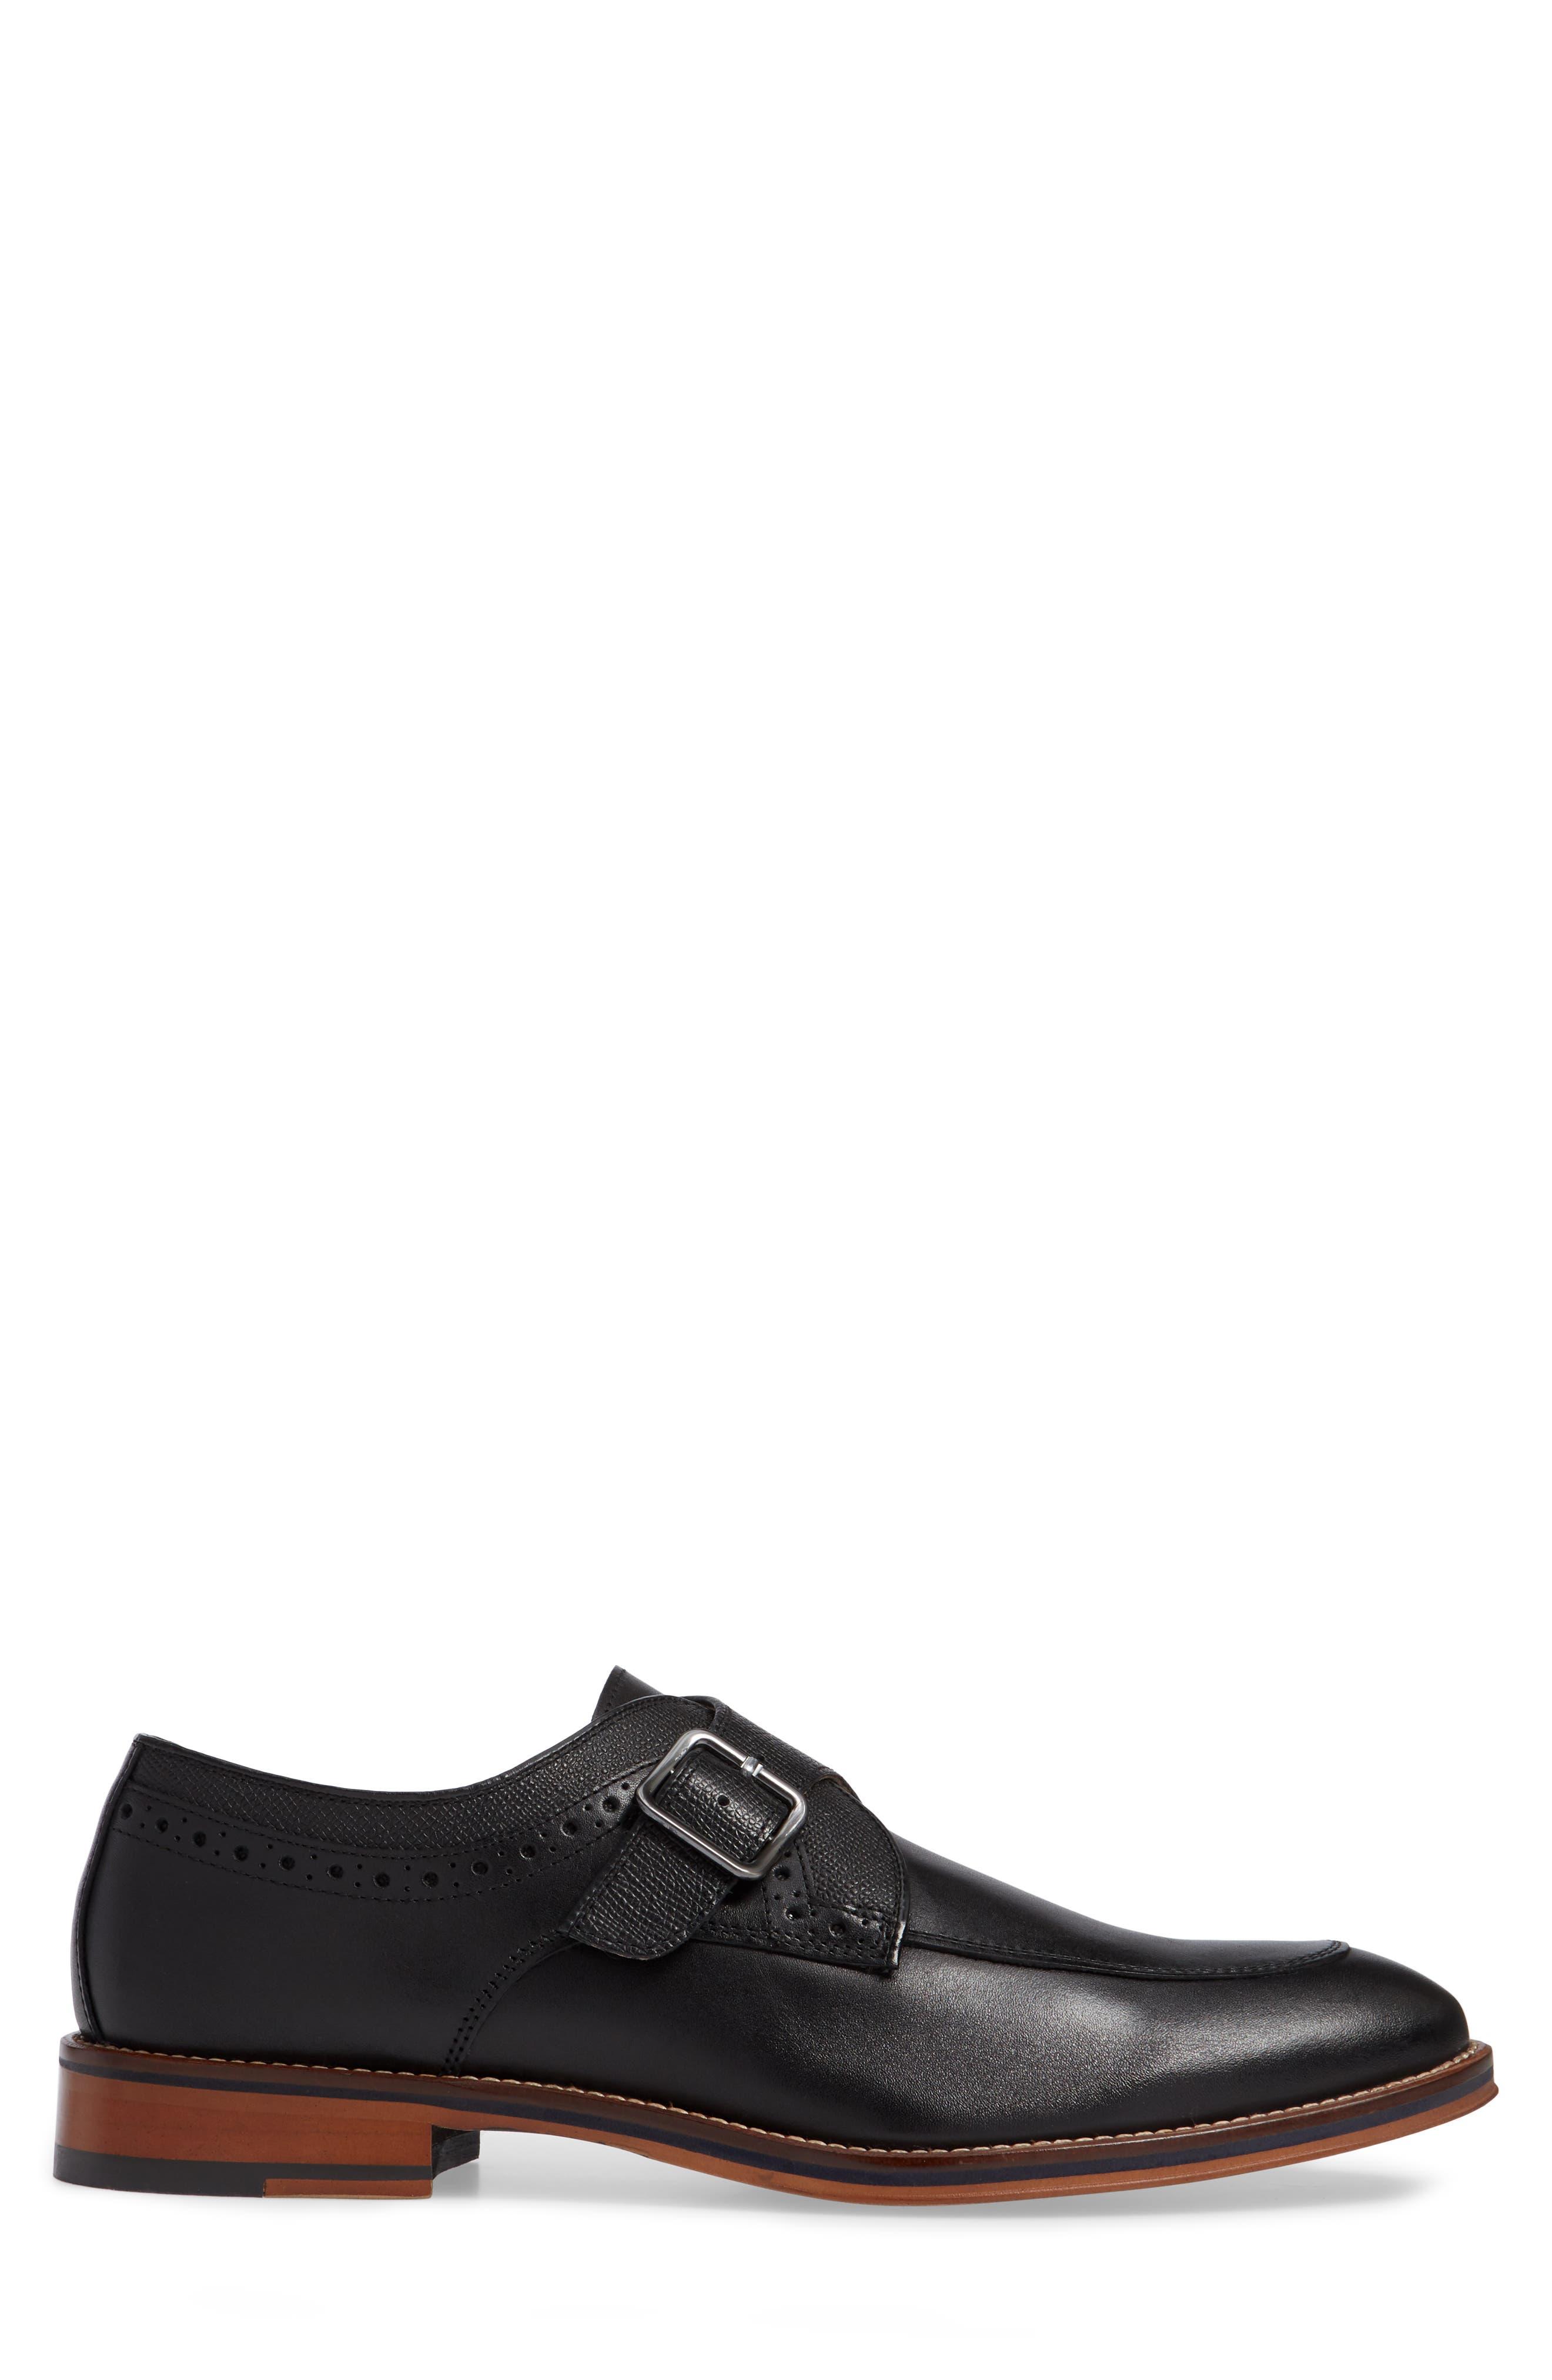 Conard Monk Strap Shoe,                             Alternate thumbnail 3, color,                             BLACK LEATHER